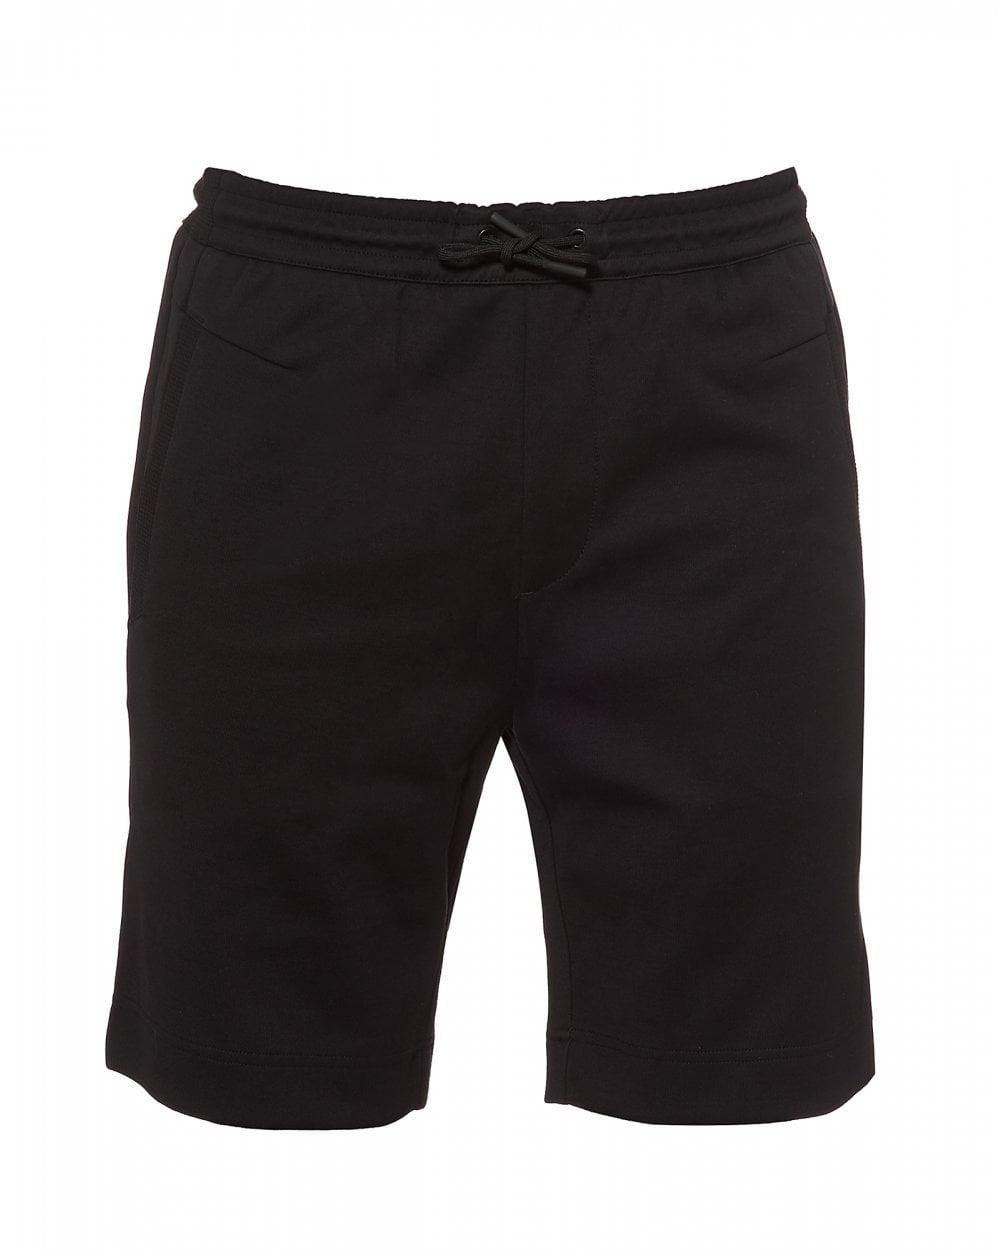 2822dc277 BOSS Athleisure Mens Headlo Logo Slim Fit Black Sweat Shorts